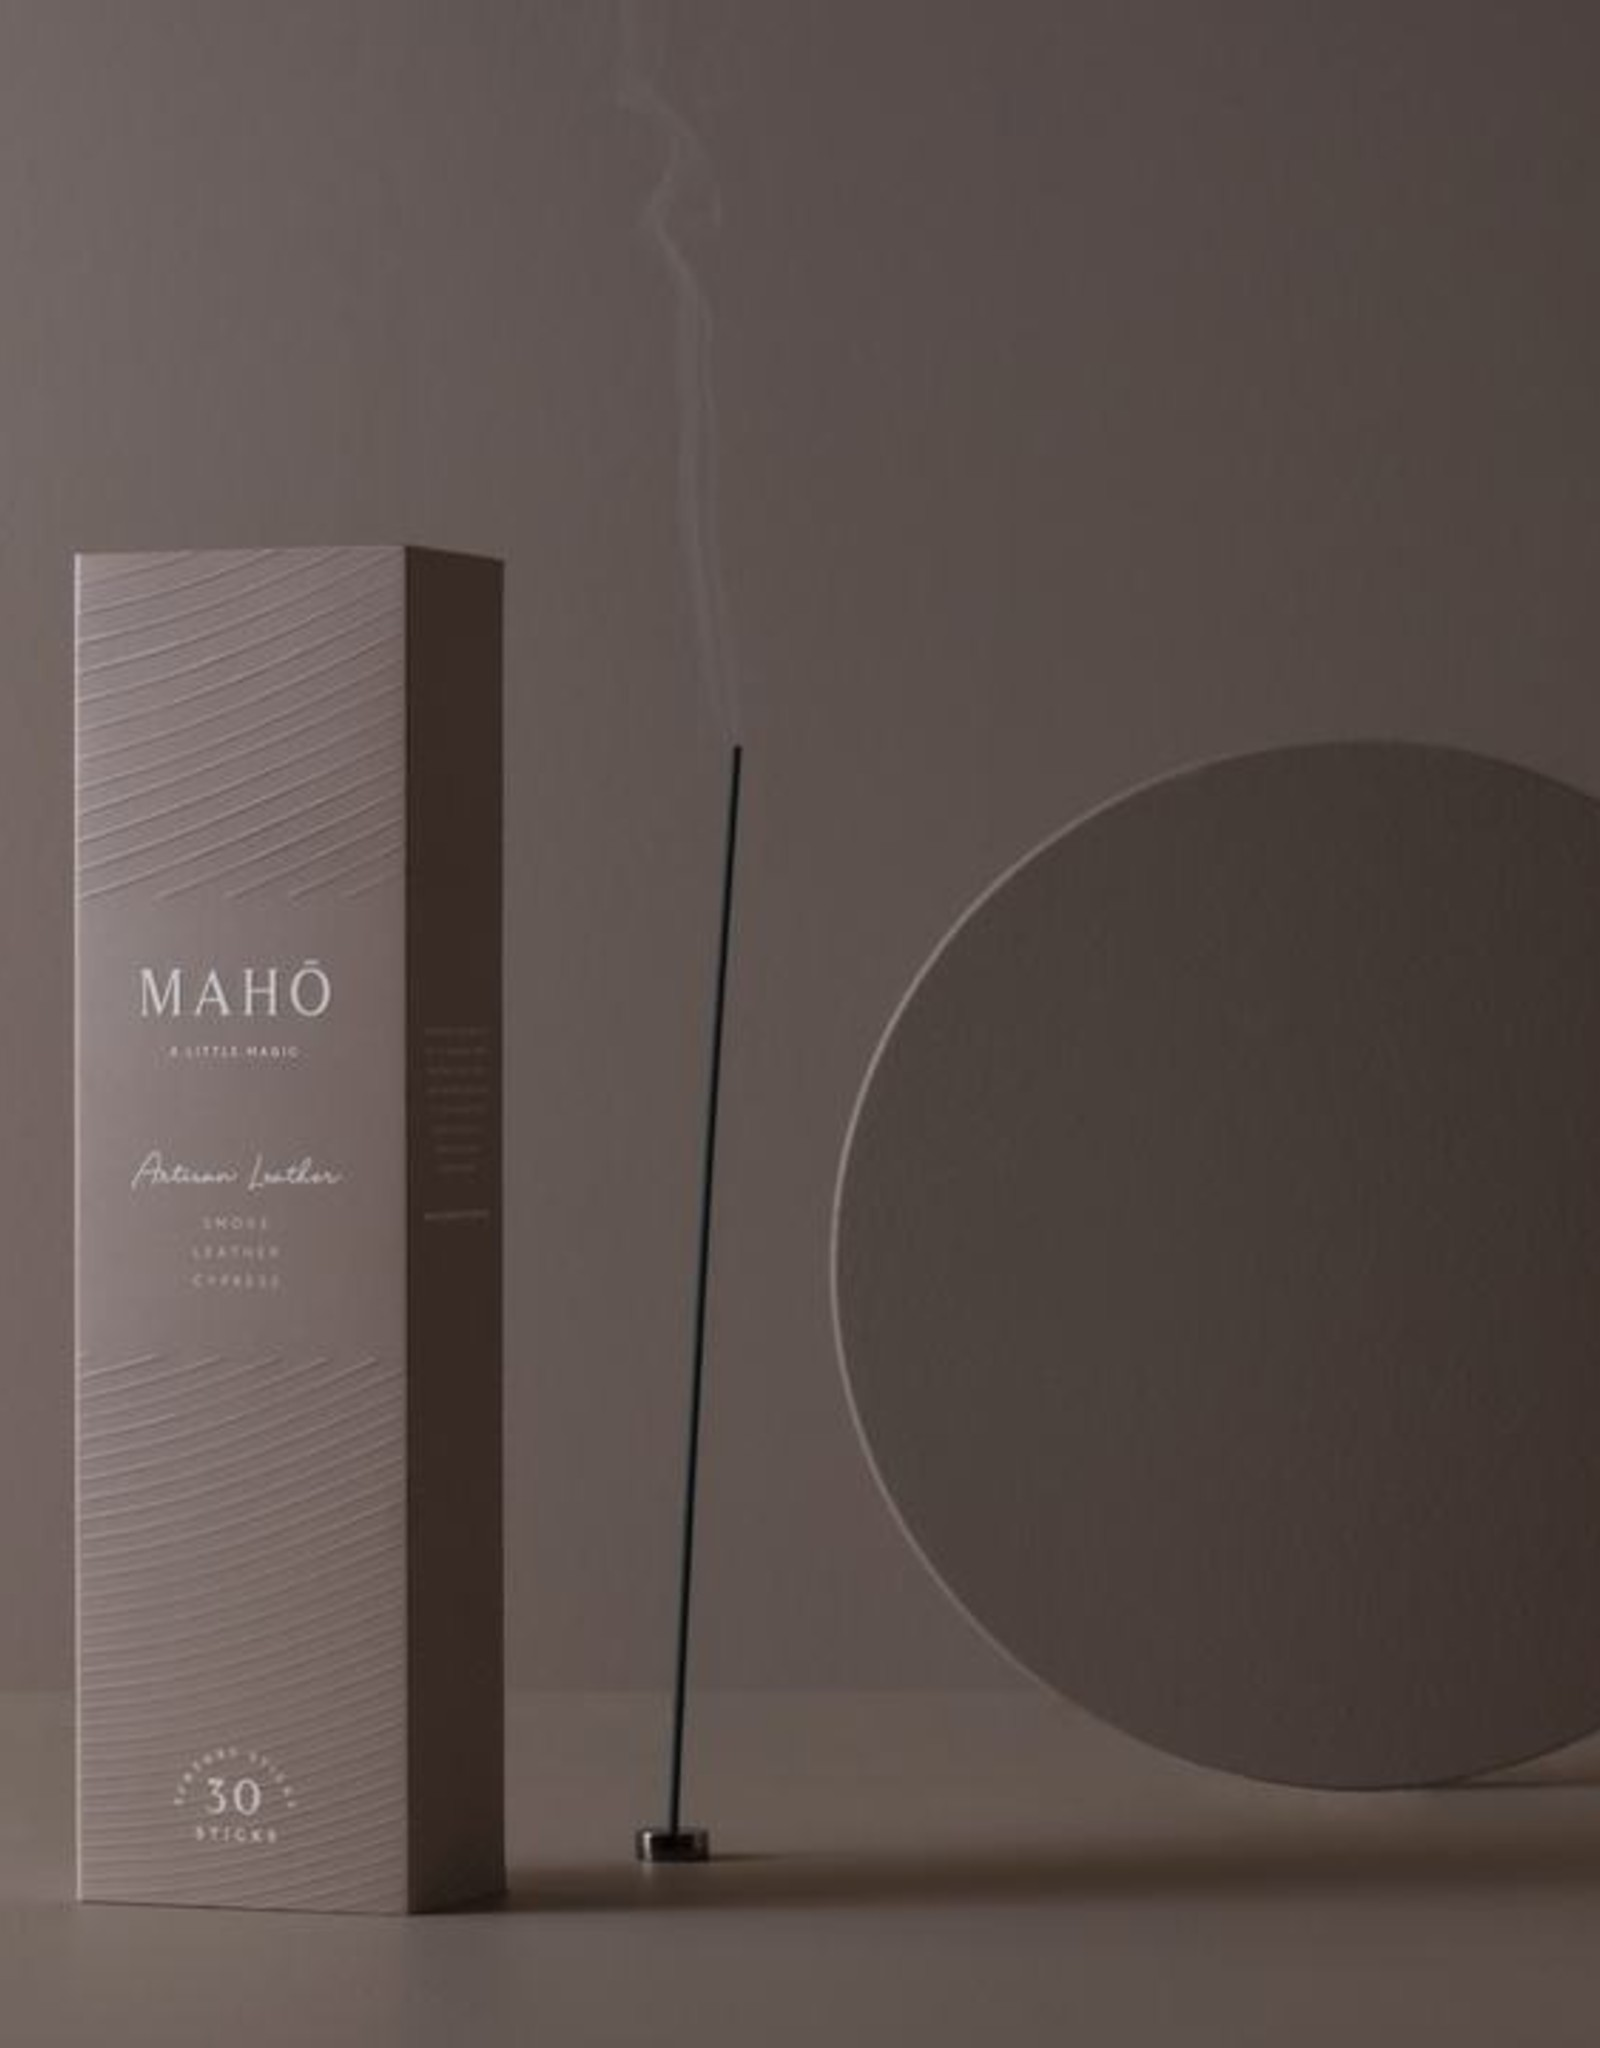 Maho ARTISAN LEATHER - Sensory Sticks